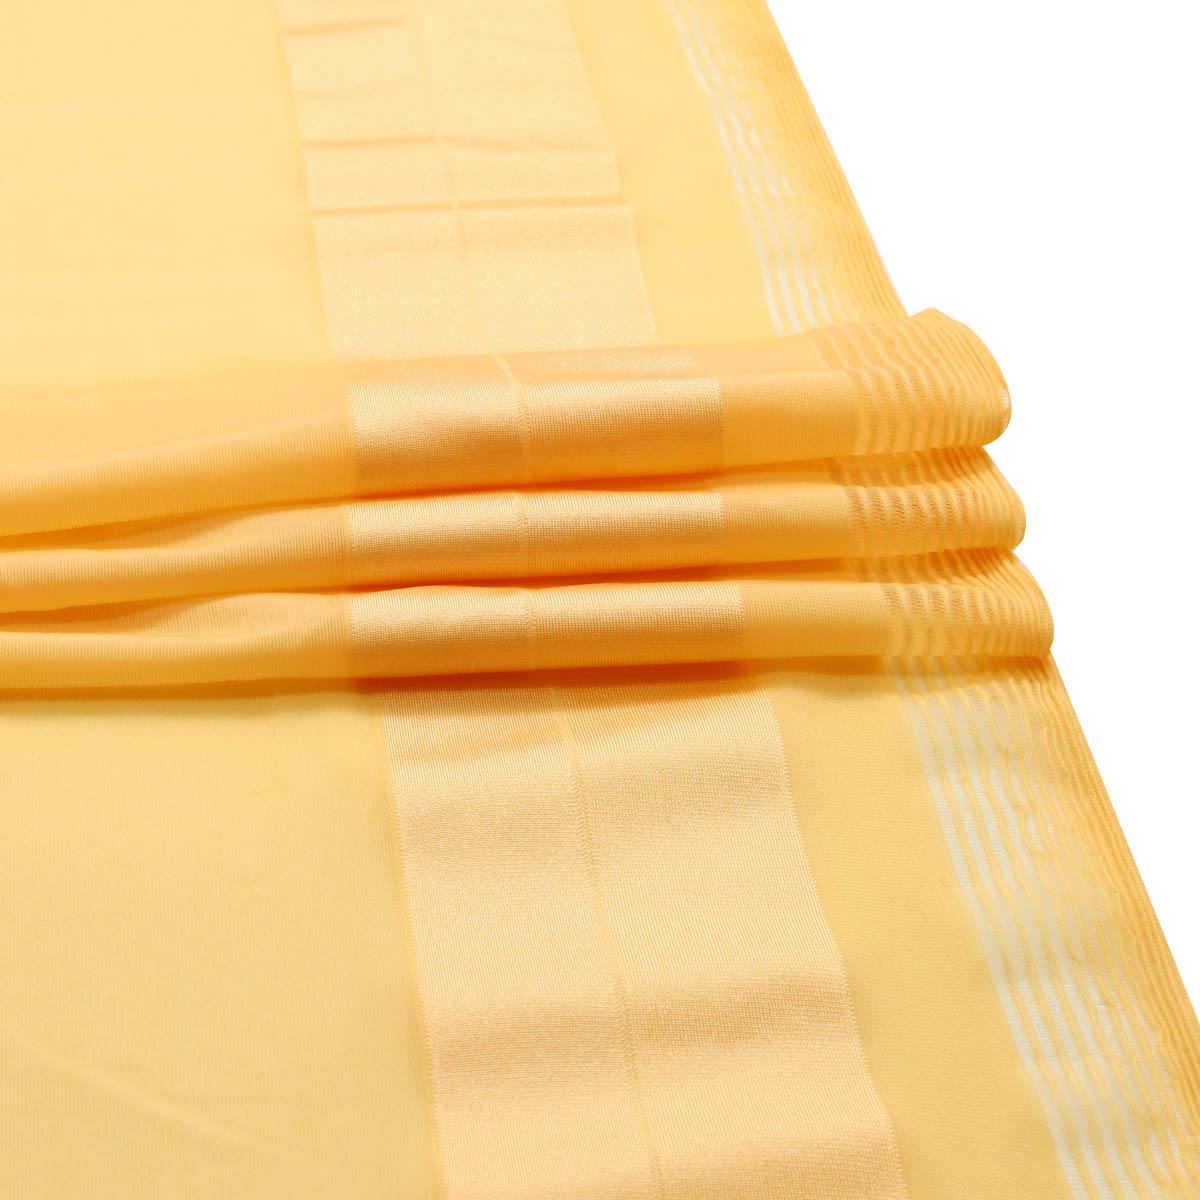 SU 108 Ткань эластичная бельевая 116 см*10